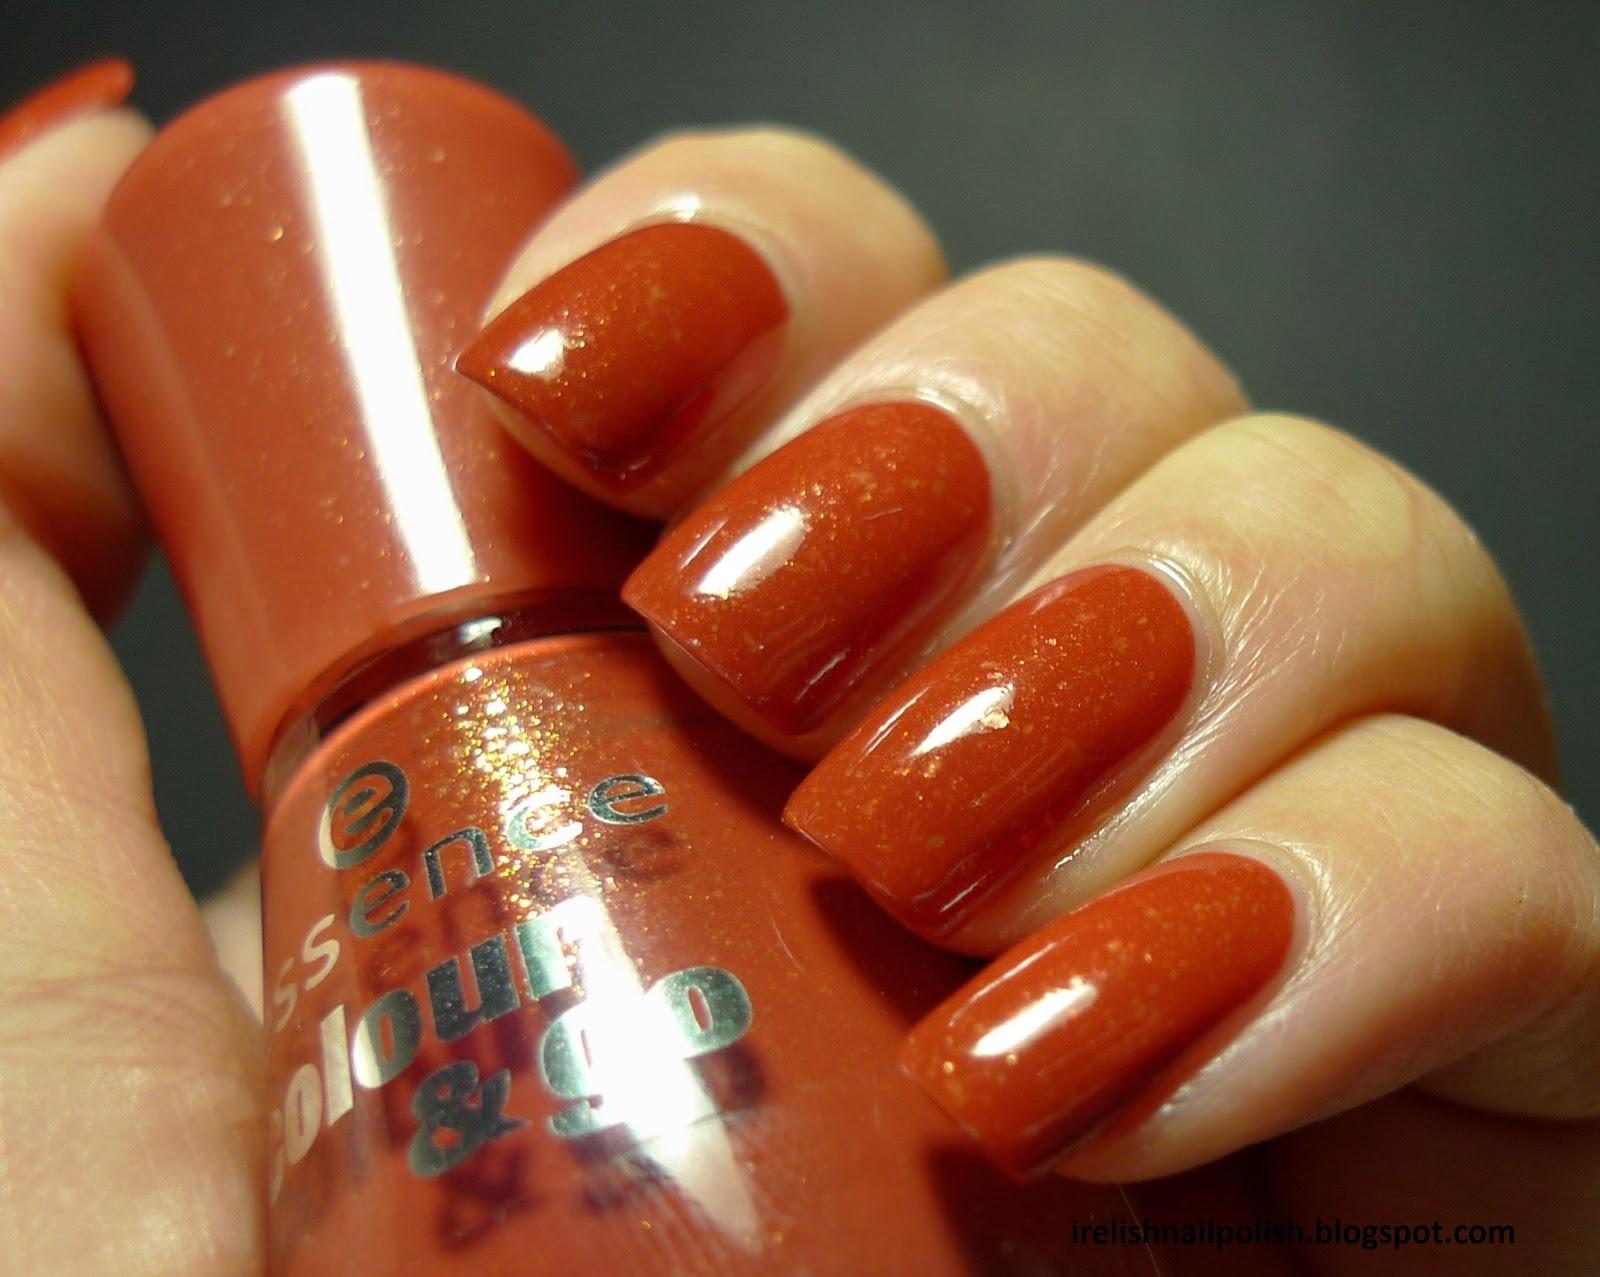 I Relish Nail Polish!: Essence - #116 Gorgeous Bling Bling